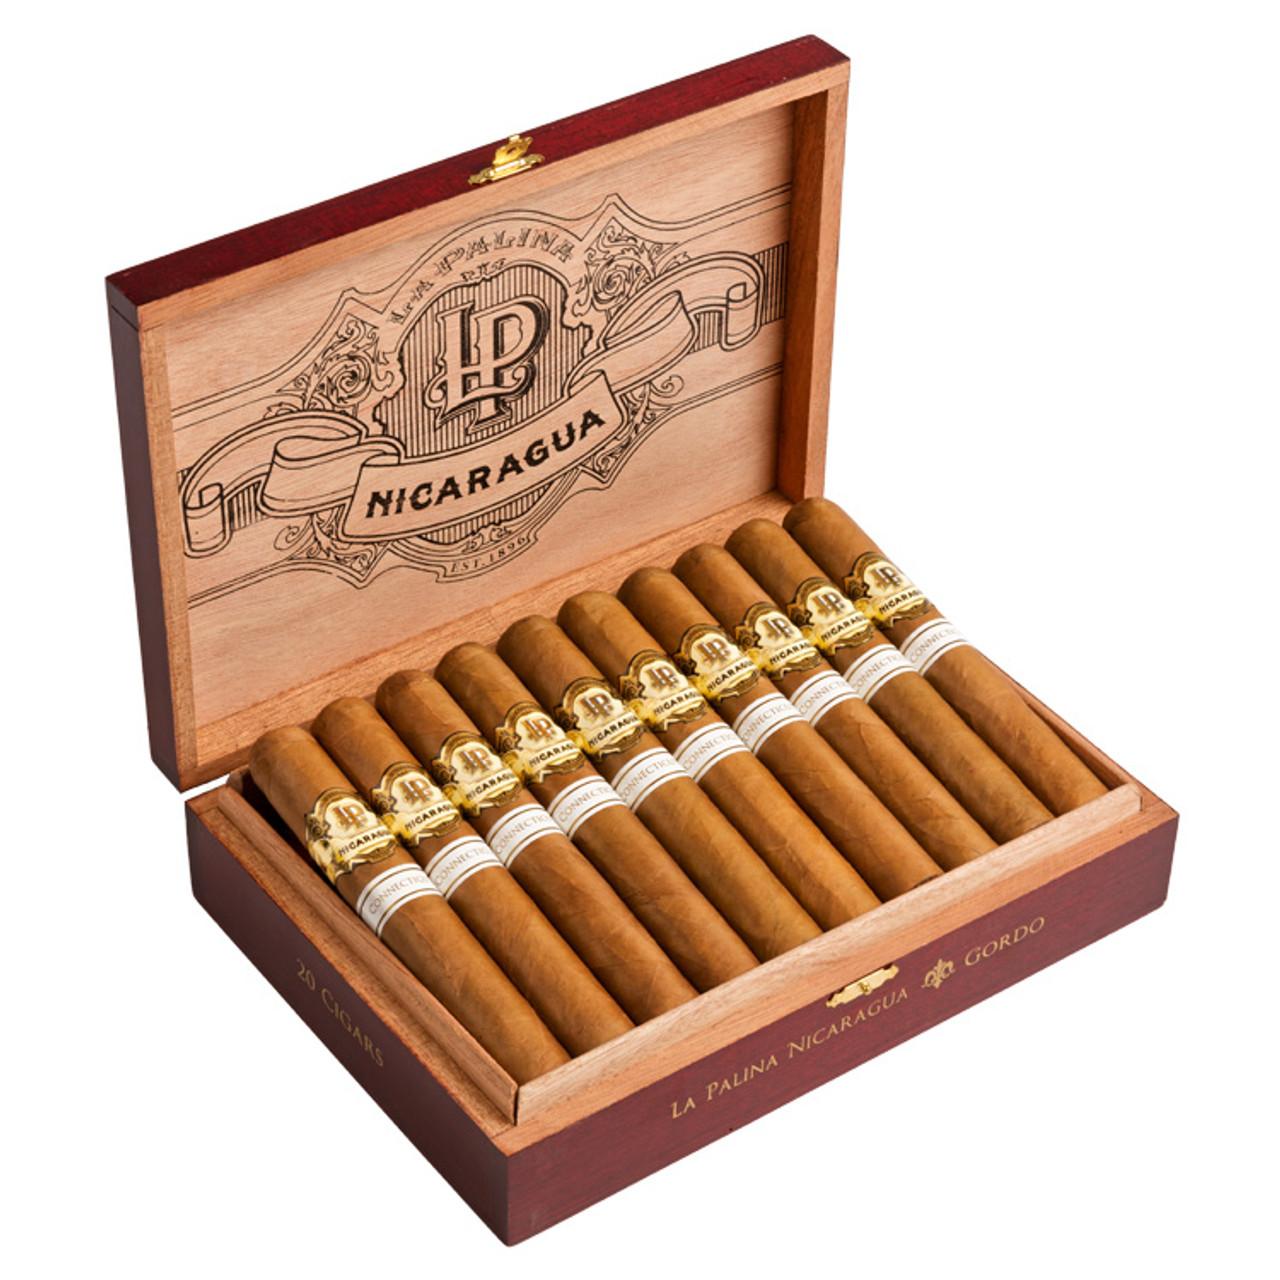 La Palina Nicaragua Oscuro Toro Cigars - 6 x 50 (Box of 20)